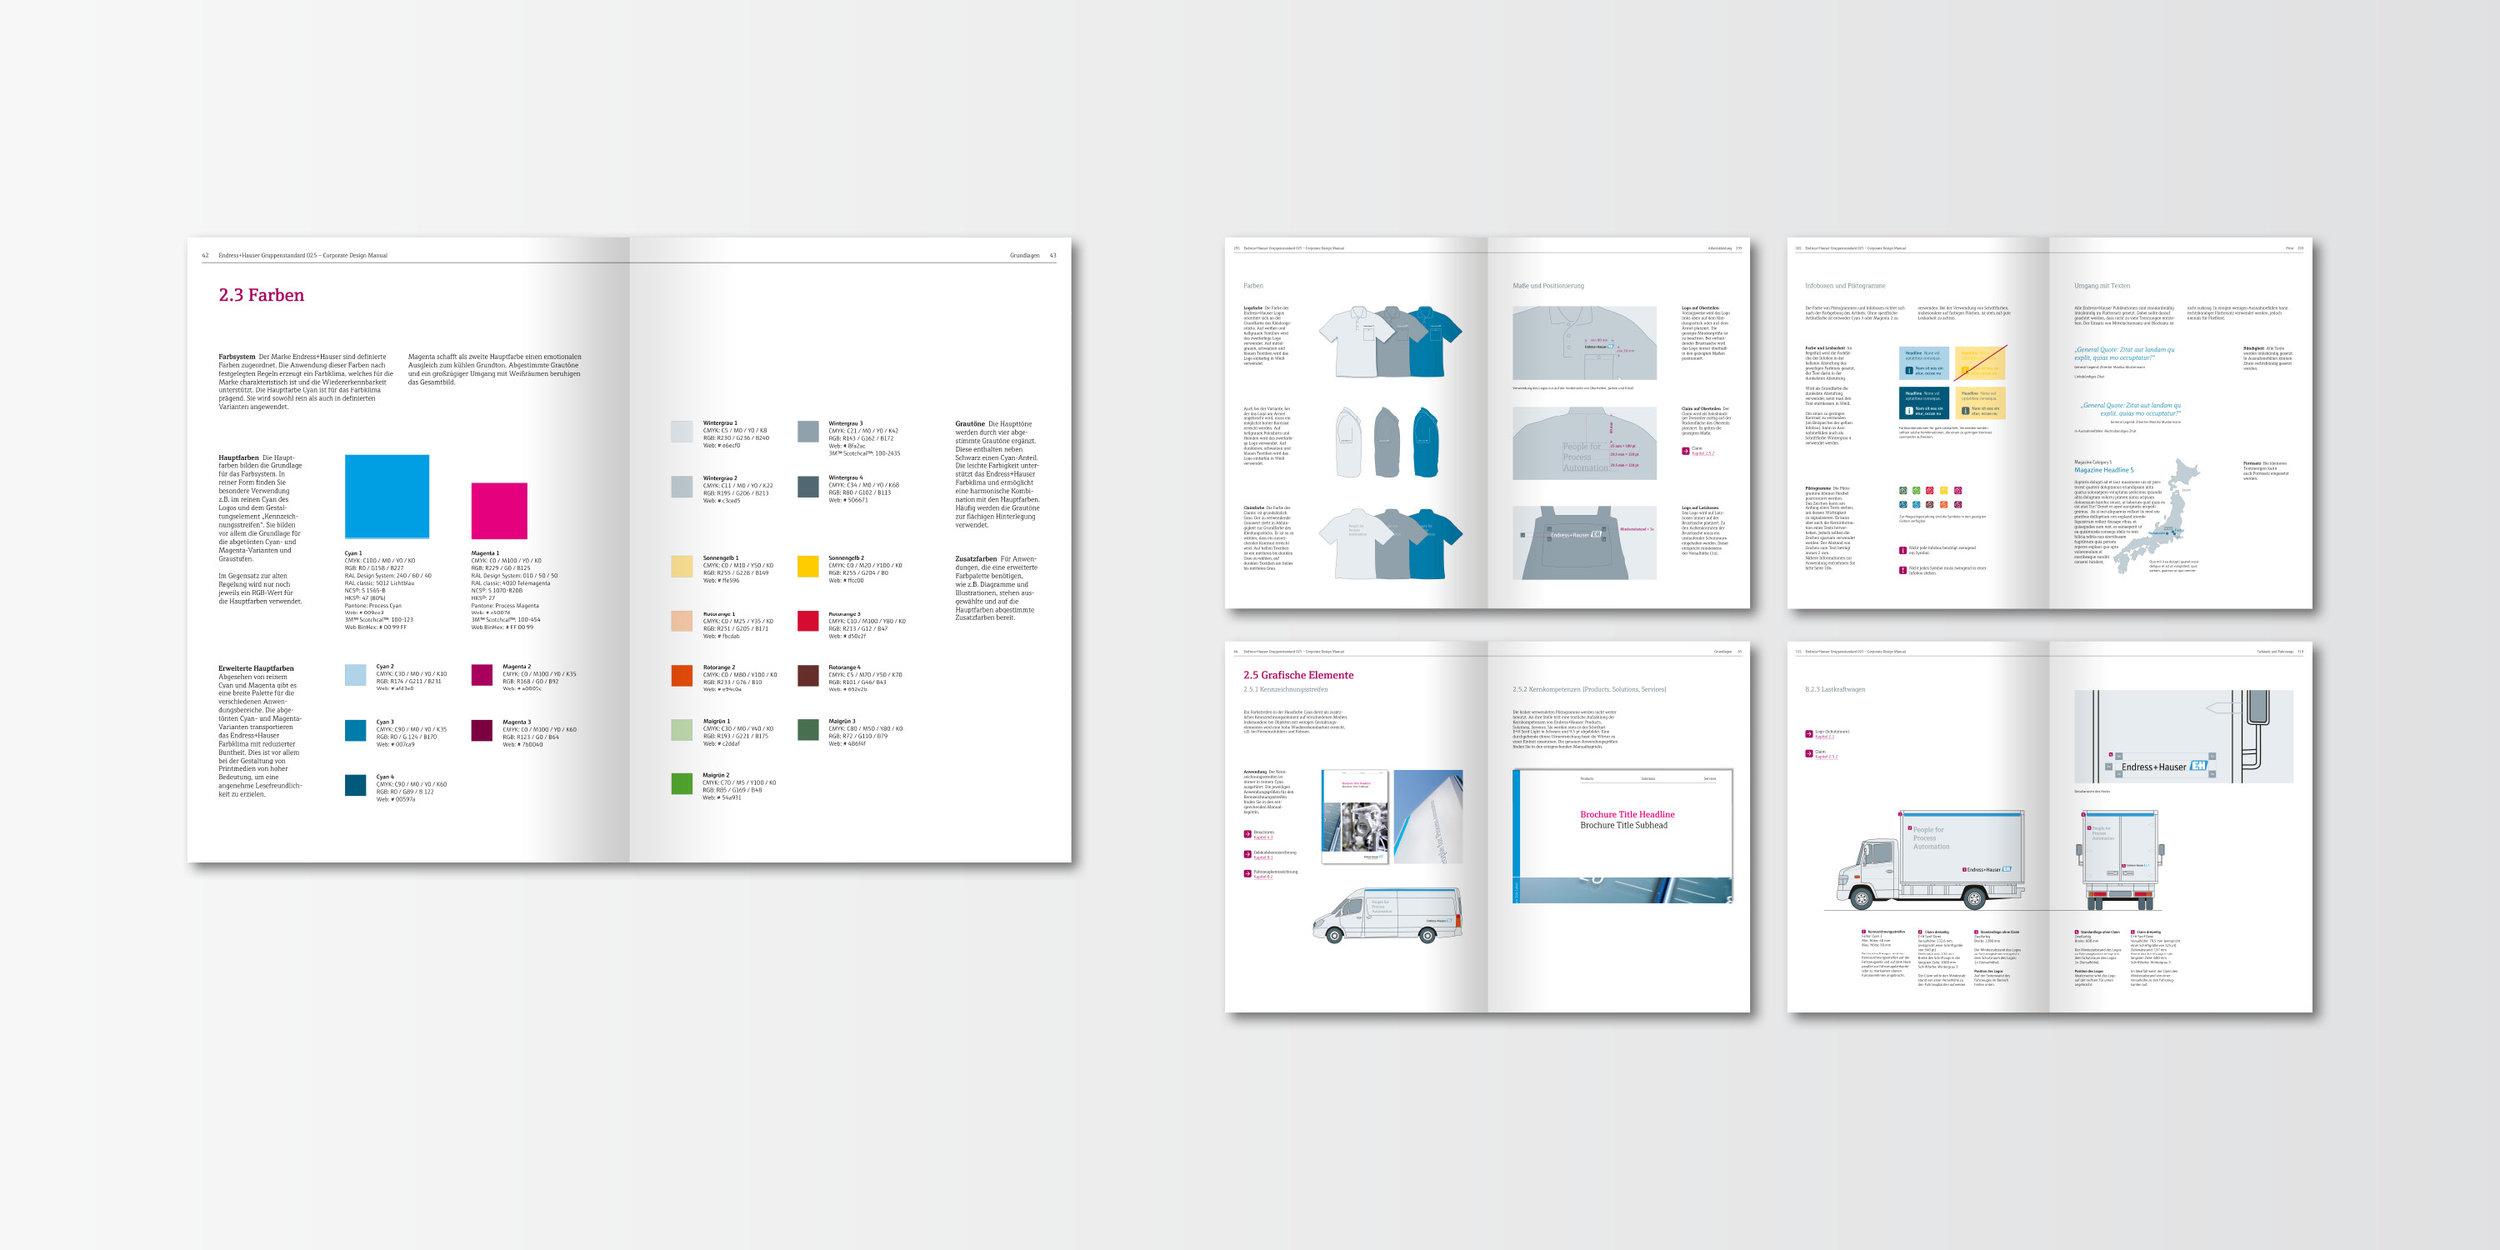 Endress+Hauser Corporate Design 04.jpg